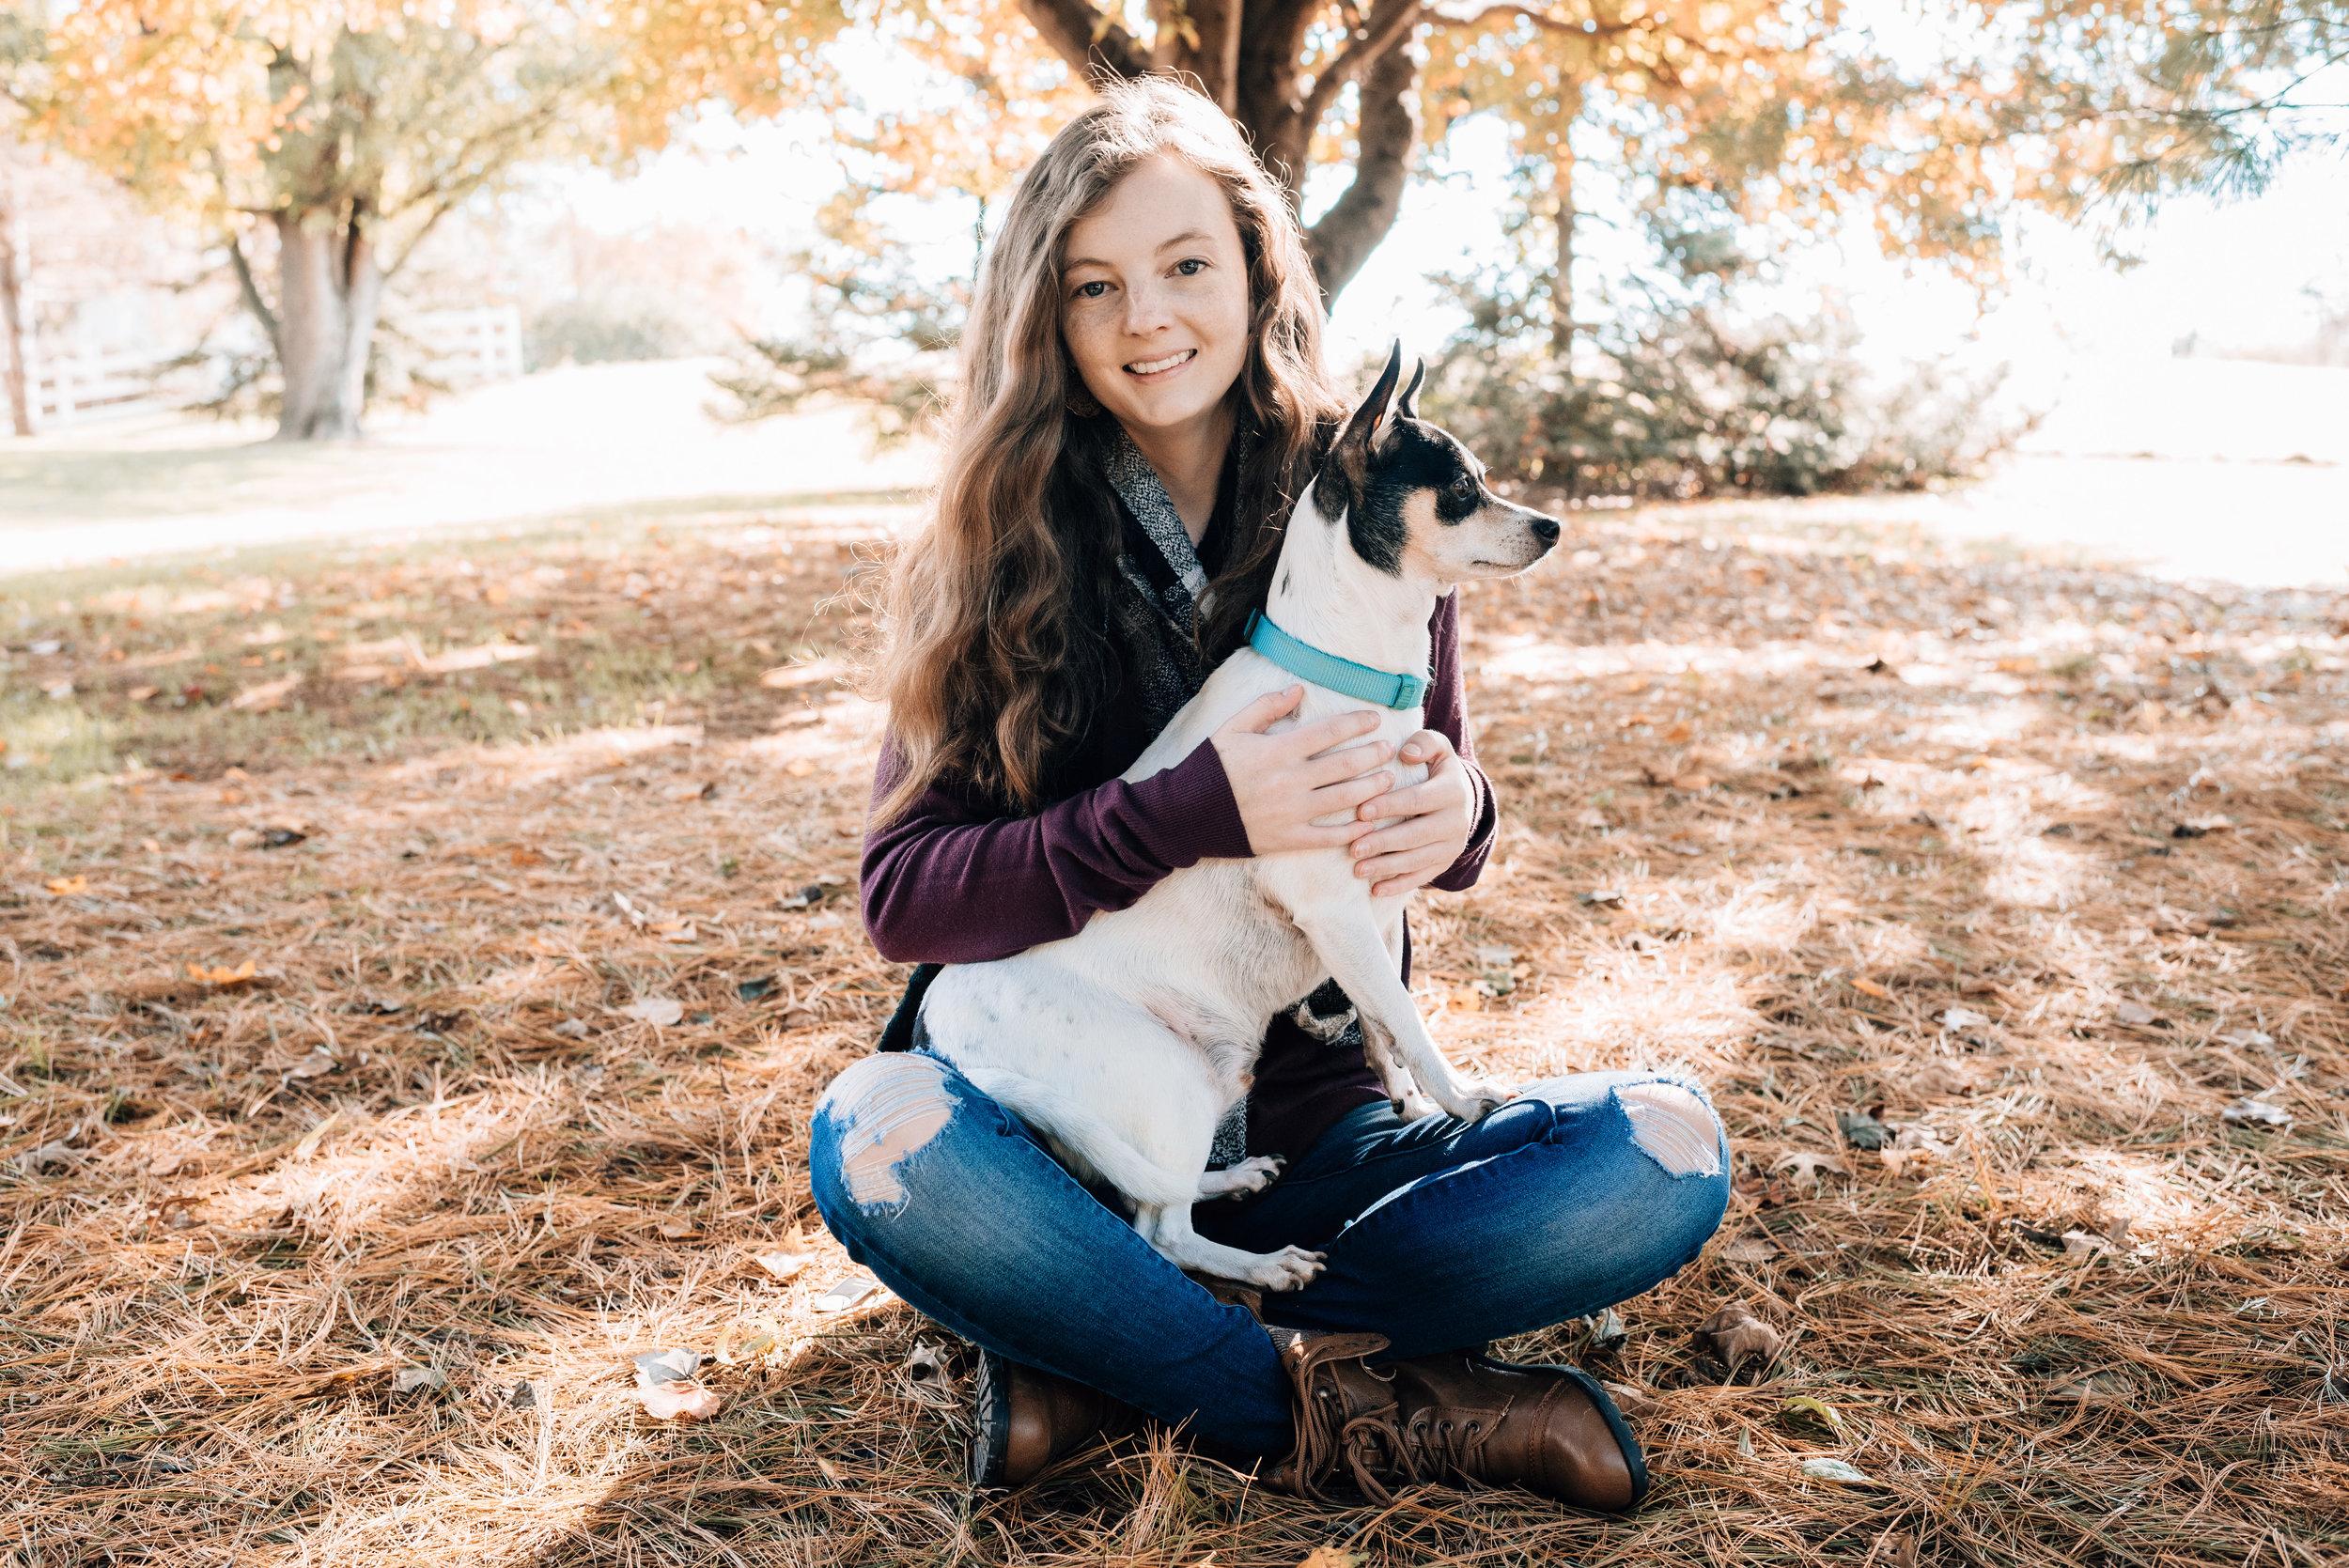 - Becca Mathews: Maryland Portrait Photographer and Photographer Mentor